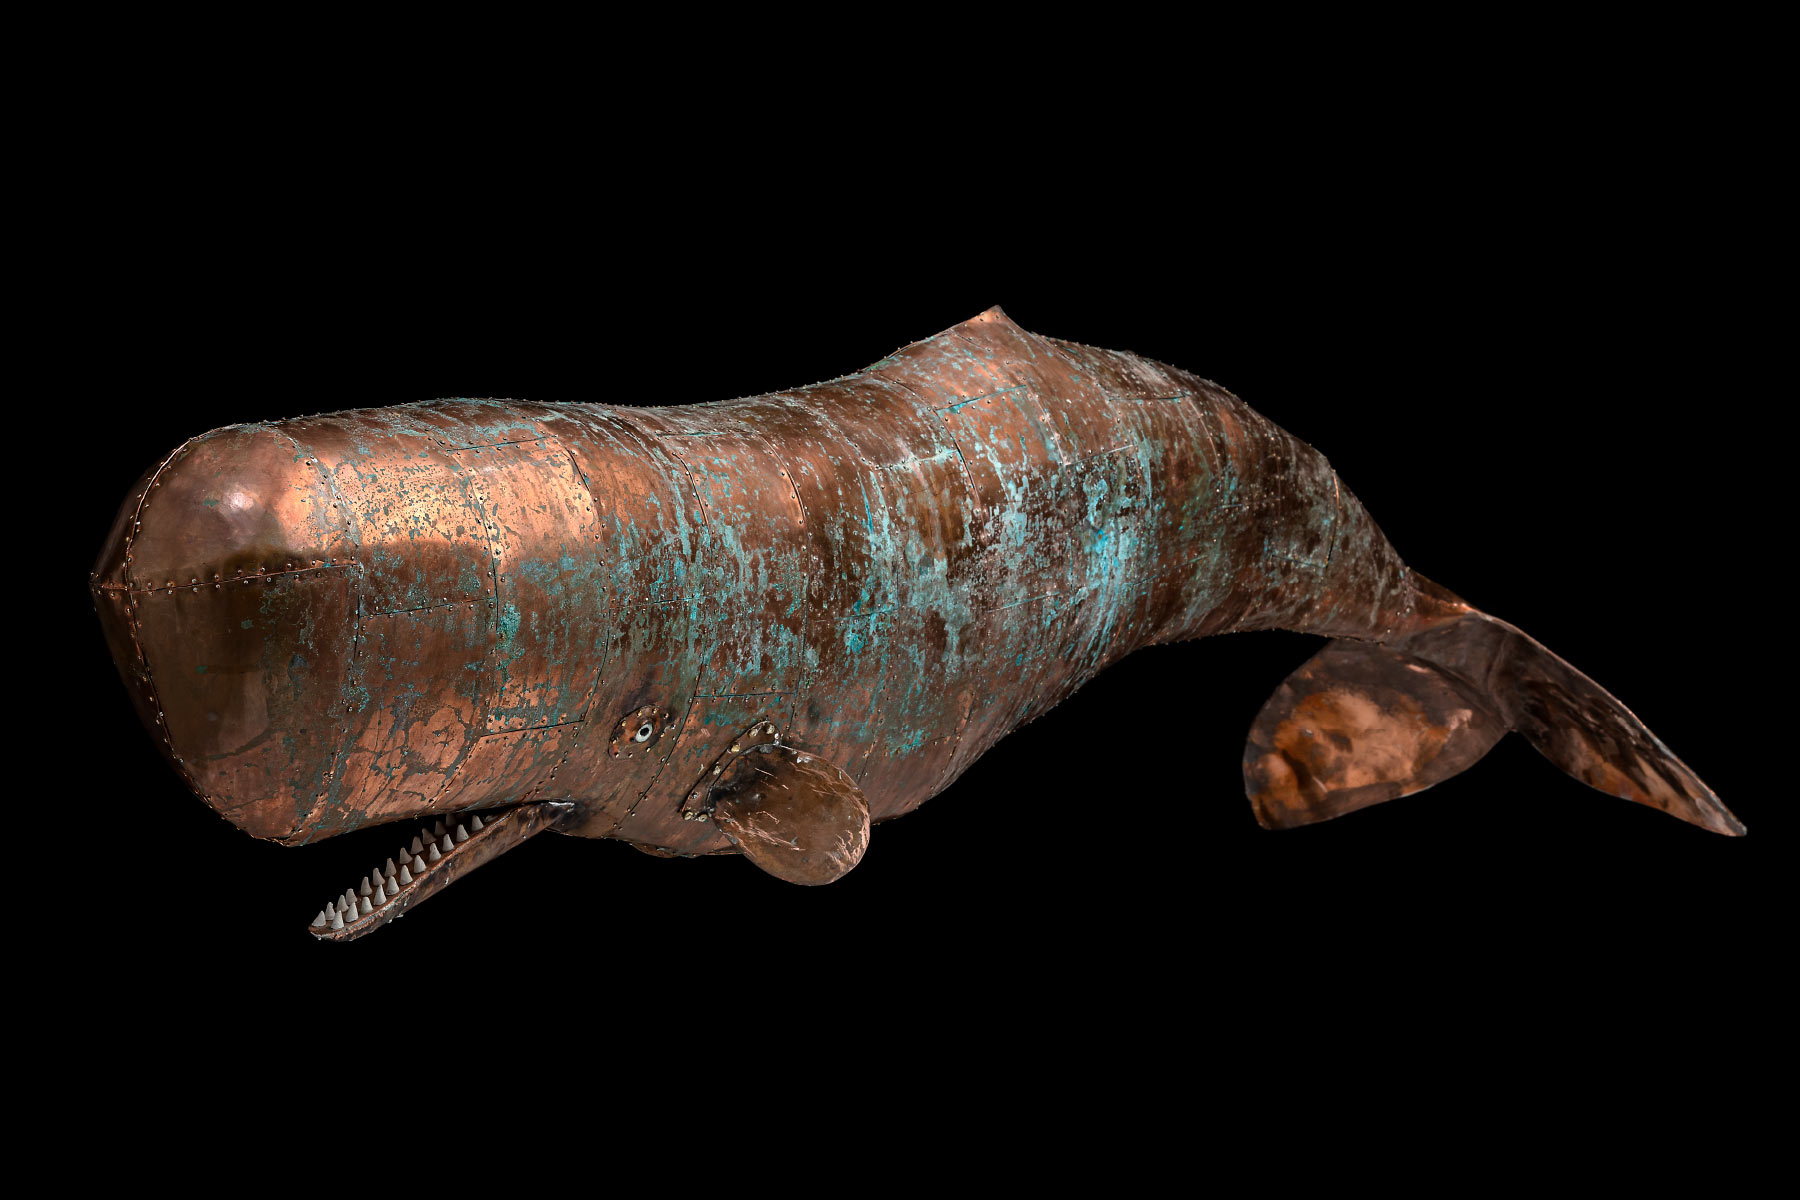 Stefano Prina Sculpture Copper Whale english weel nailed Italiano Plurale